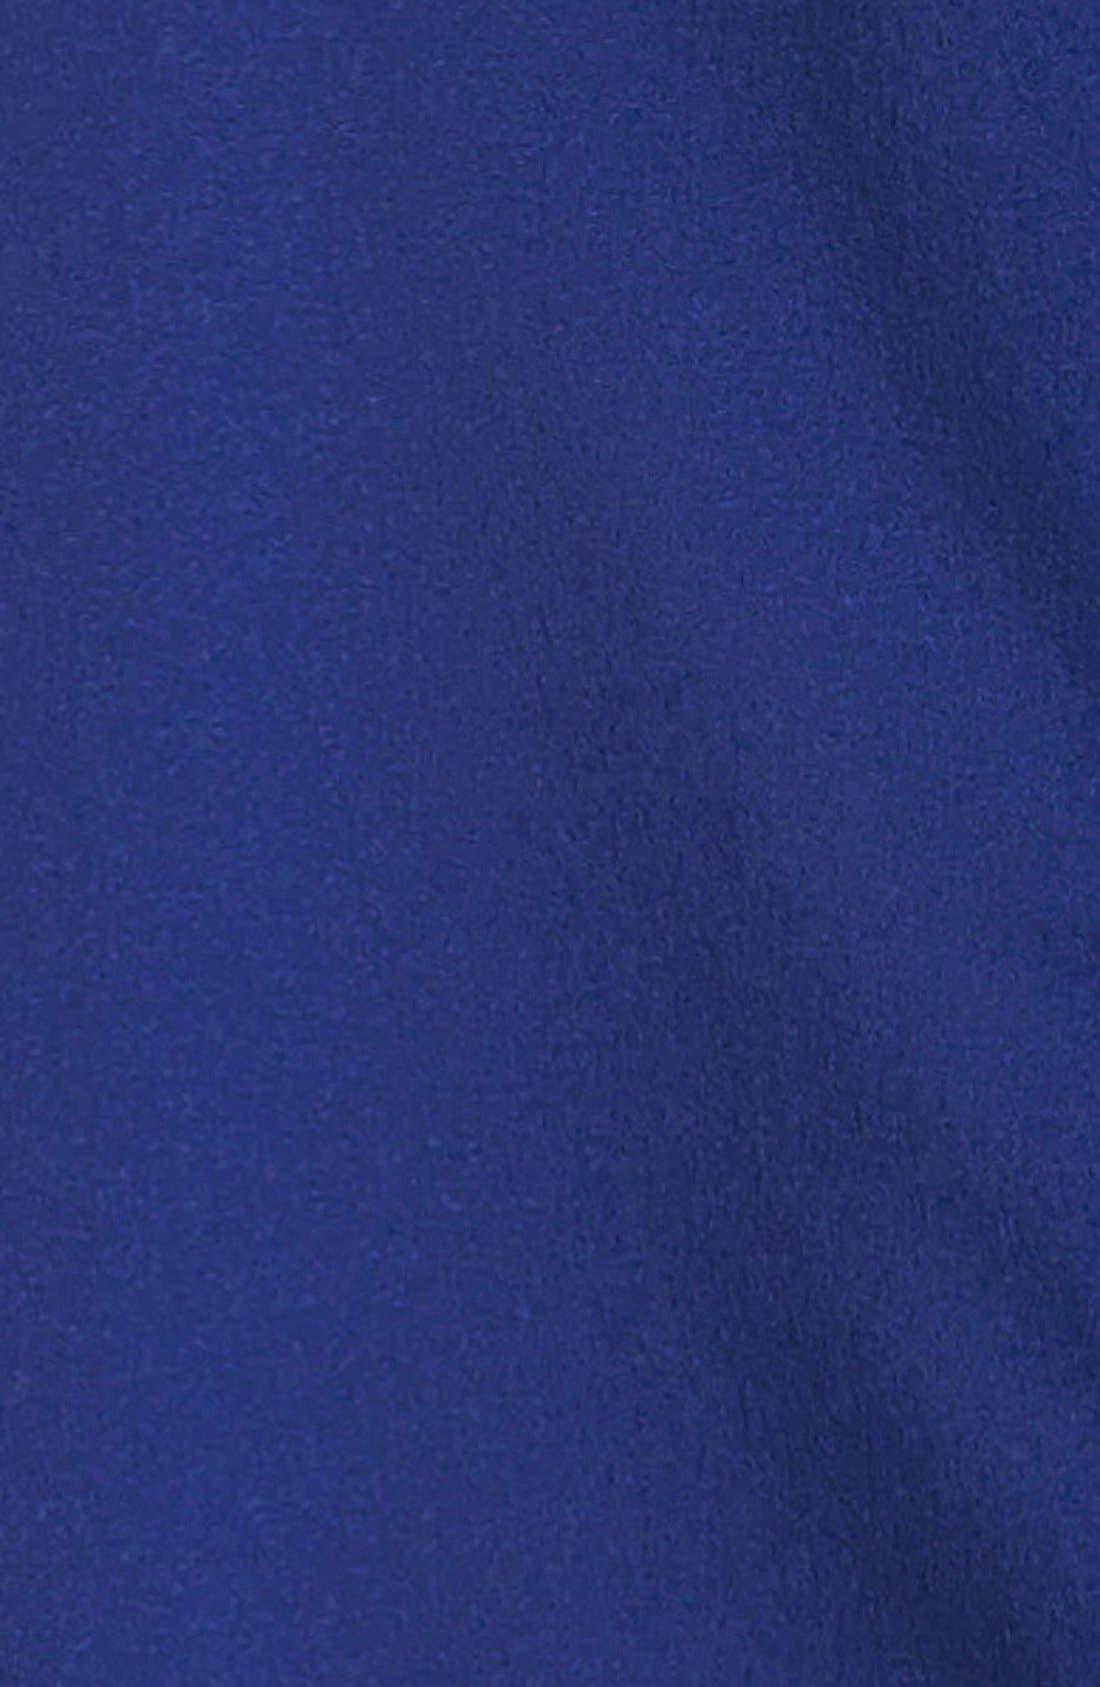 Alternate Image 4  - MINKPINK 'Mischief' Sleeveless Shirt